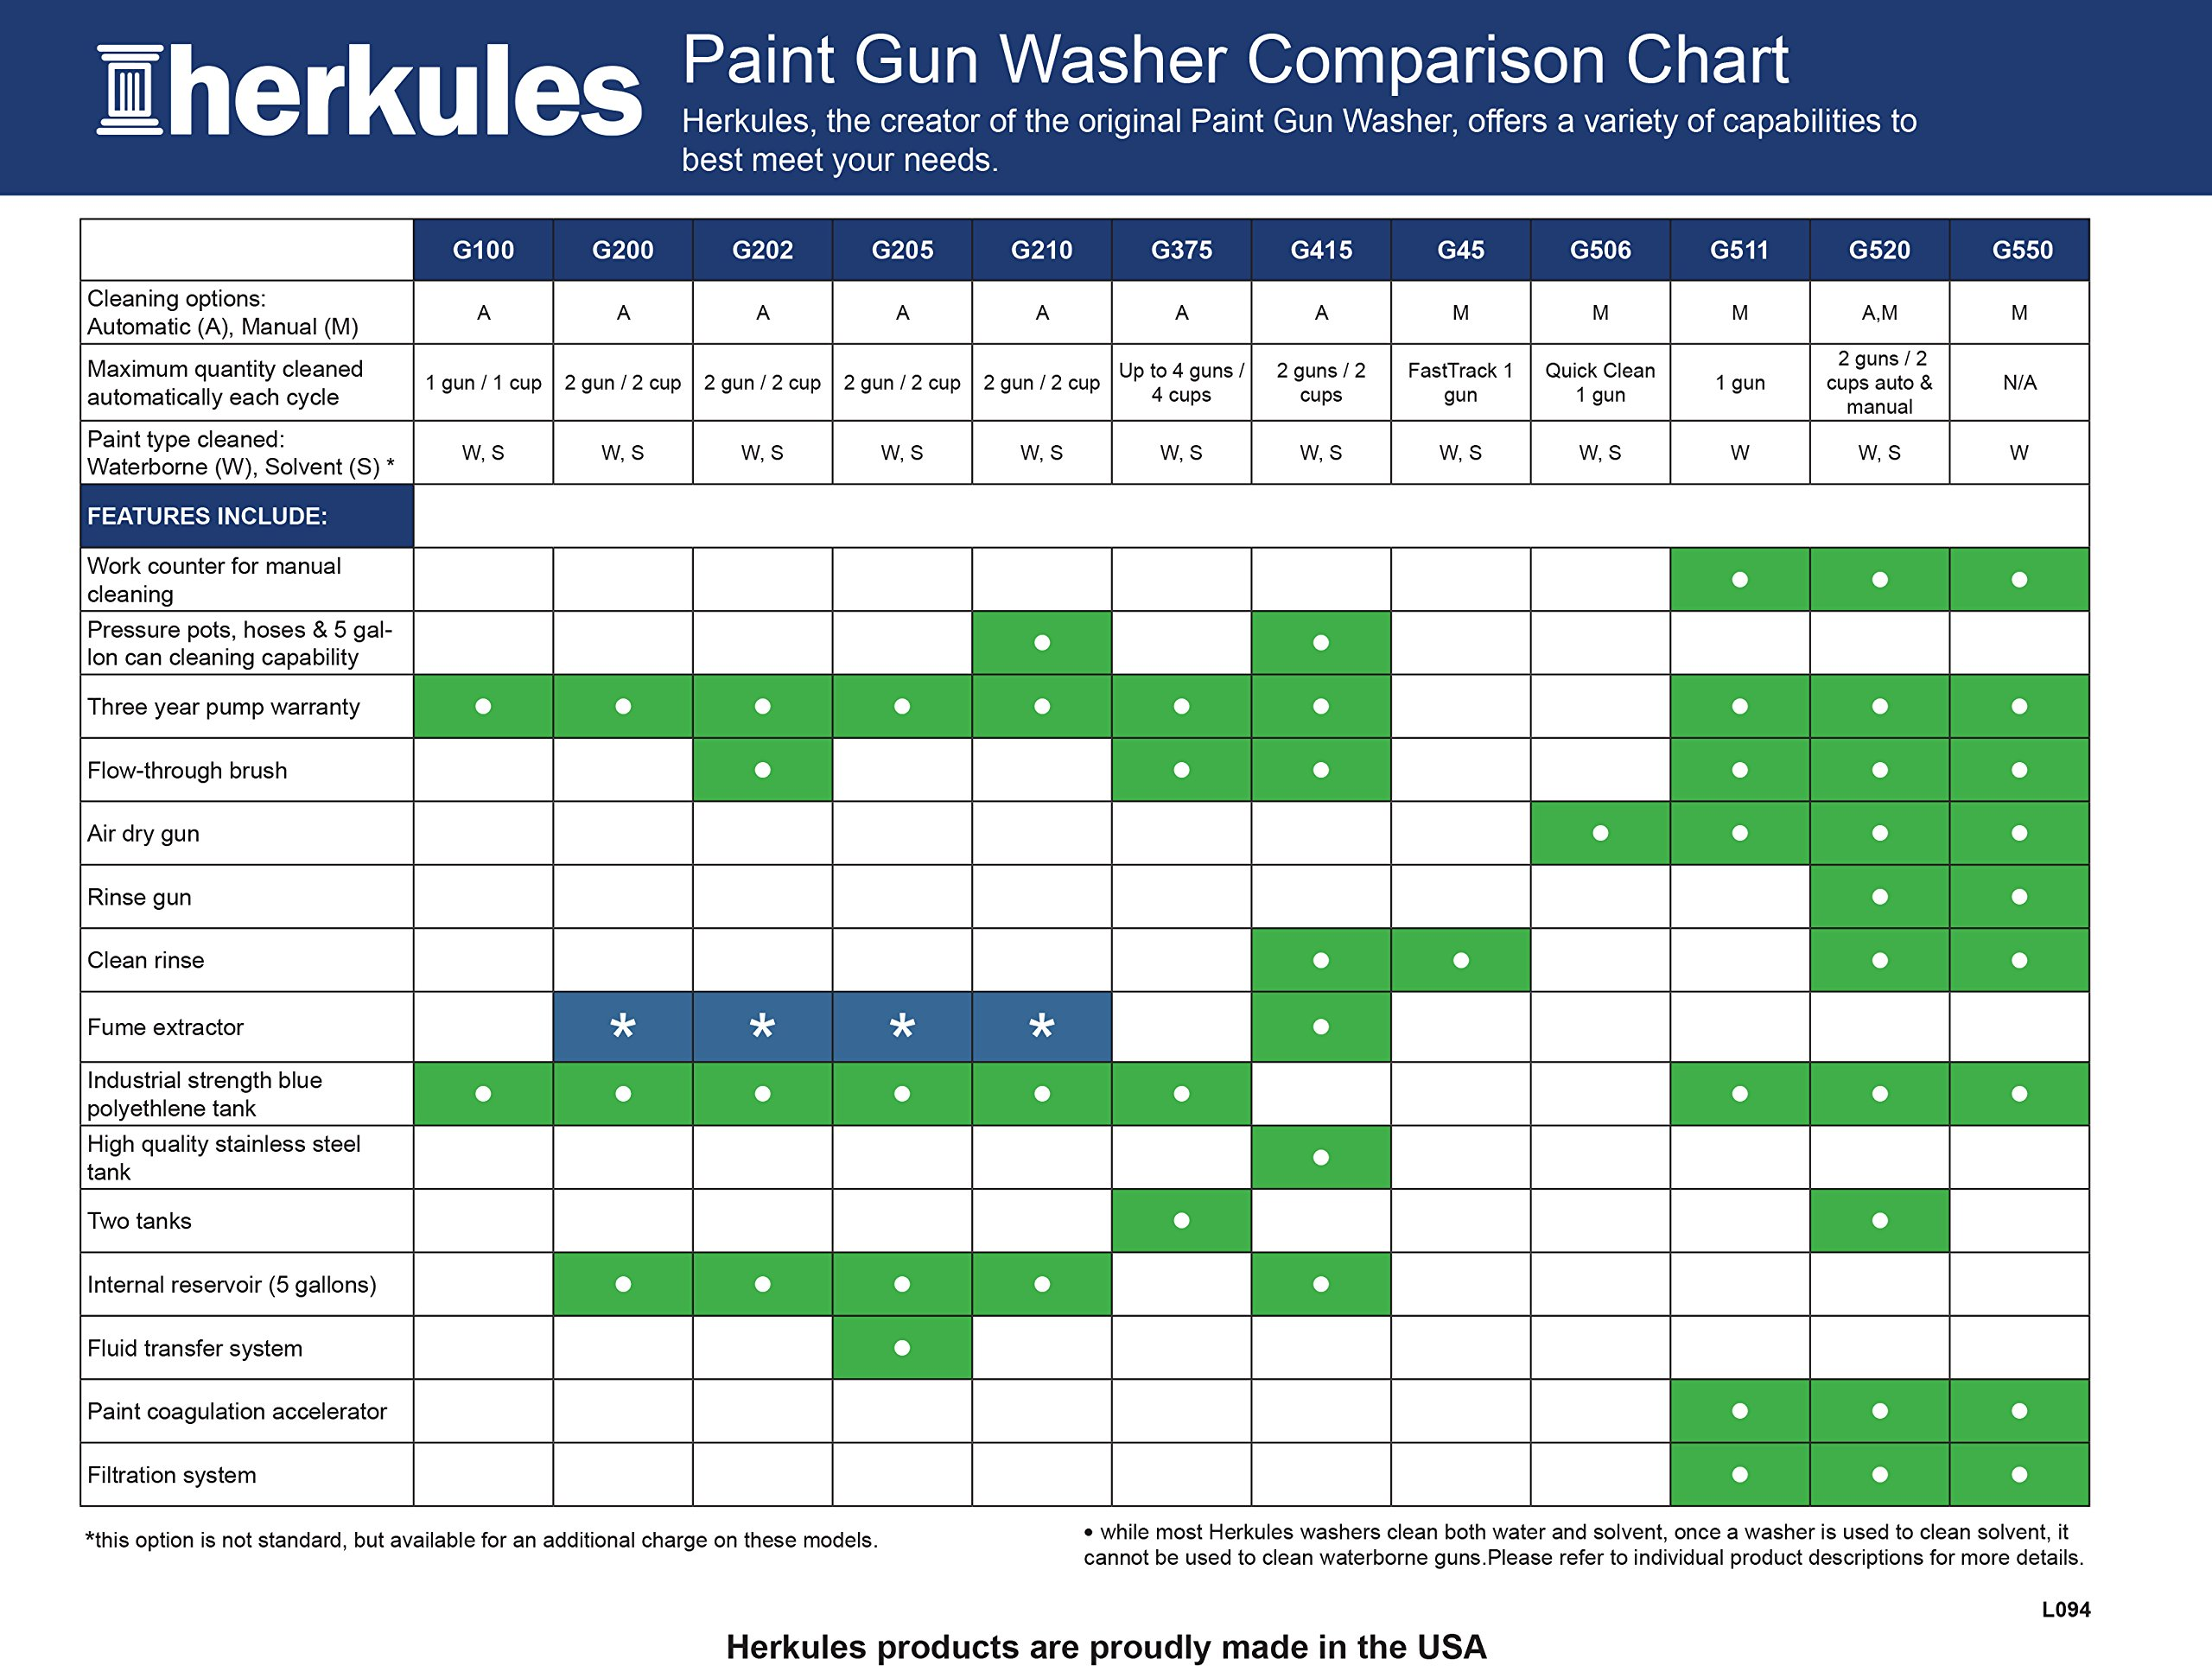 Herkules G100 Paint Gun Washer